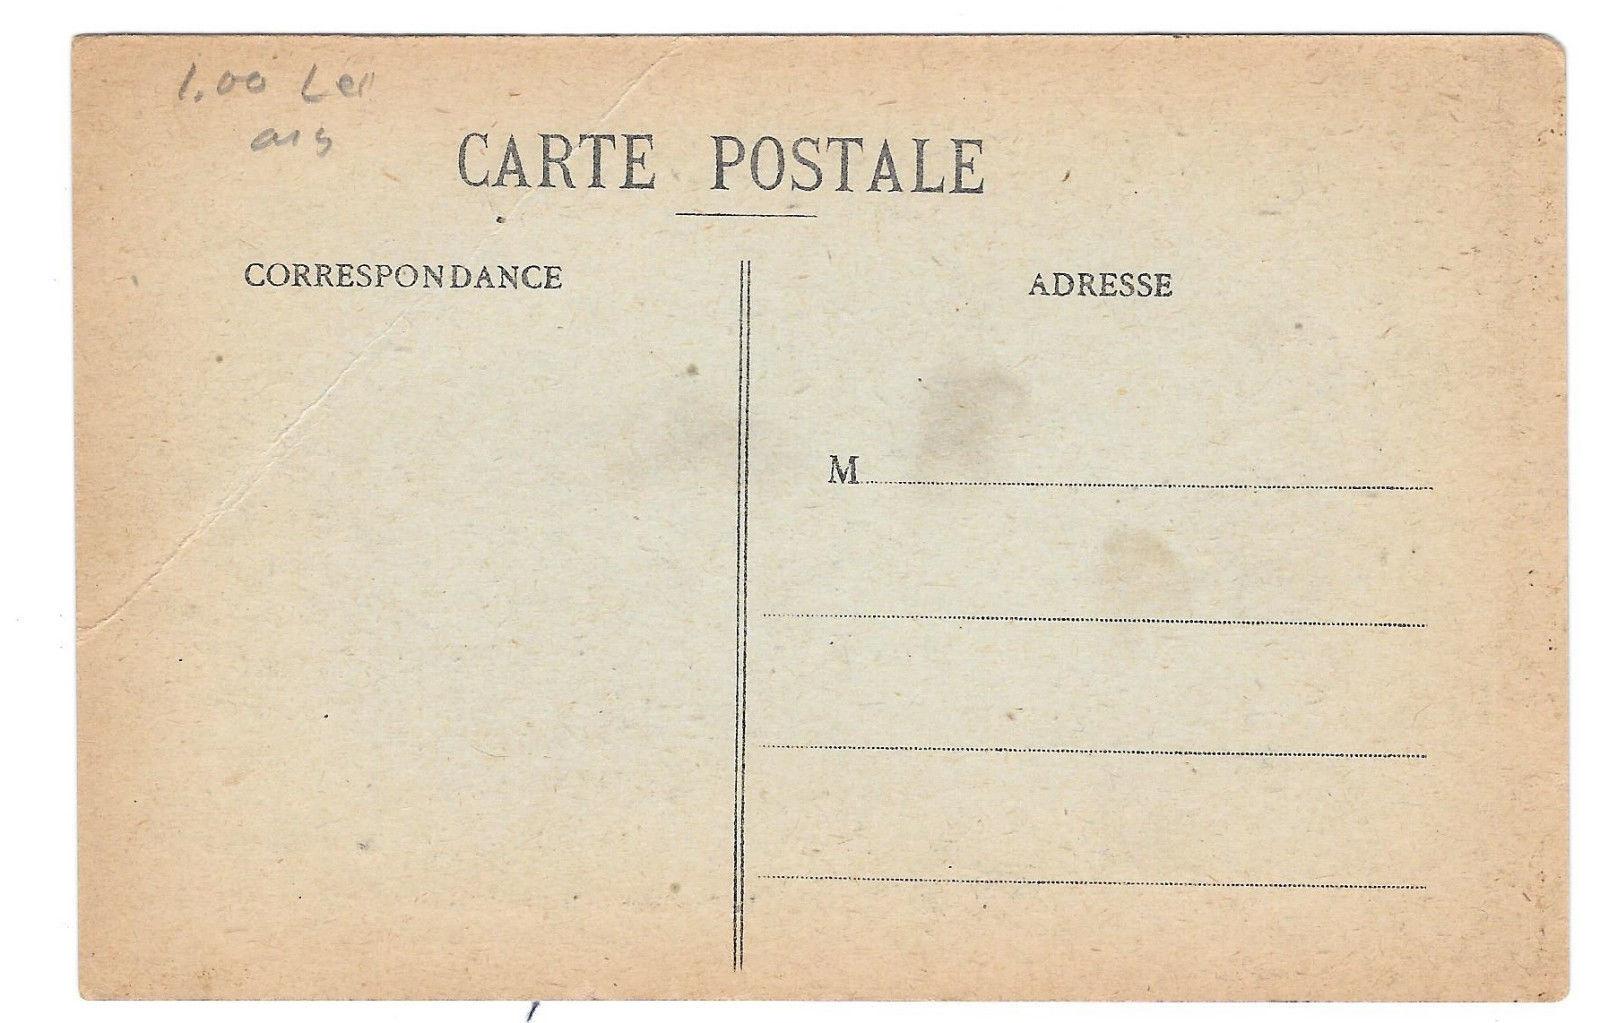 France Metz WWI President of Republic 319c Flag 1918 Place d'Armes Vtg Postcard